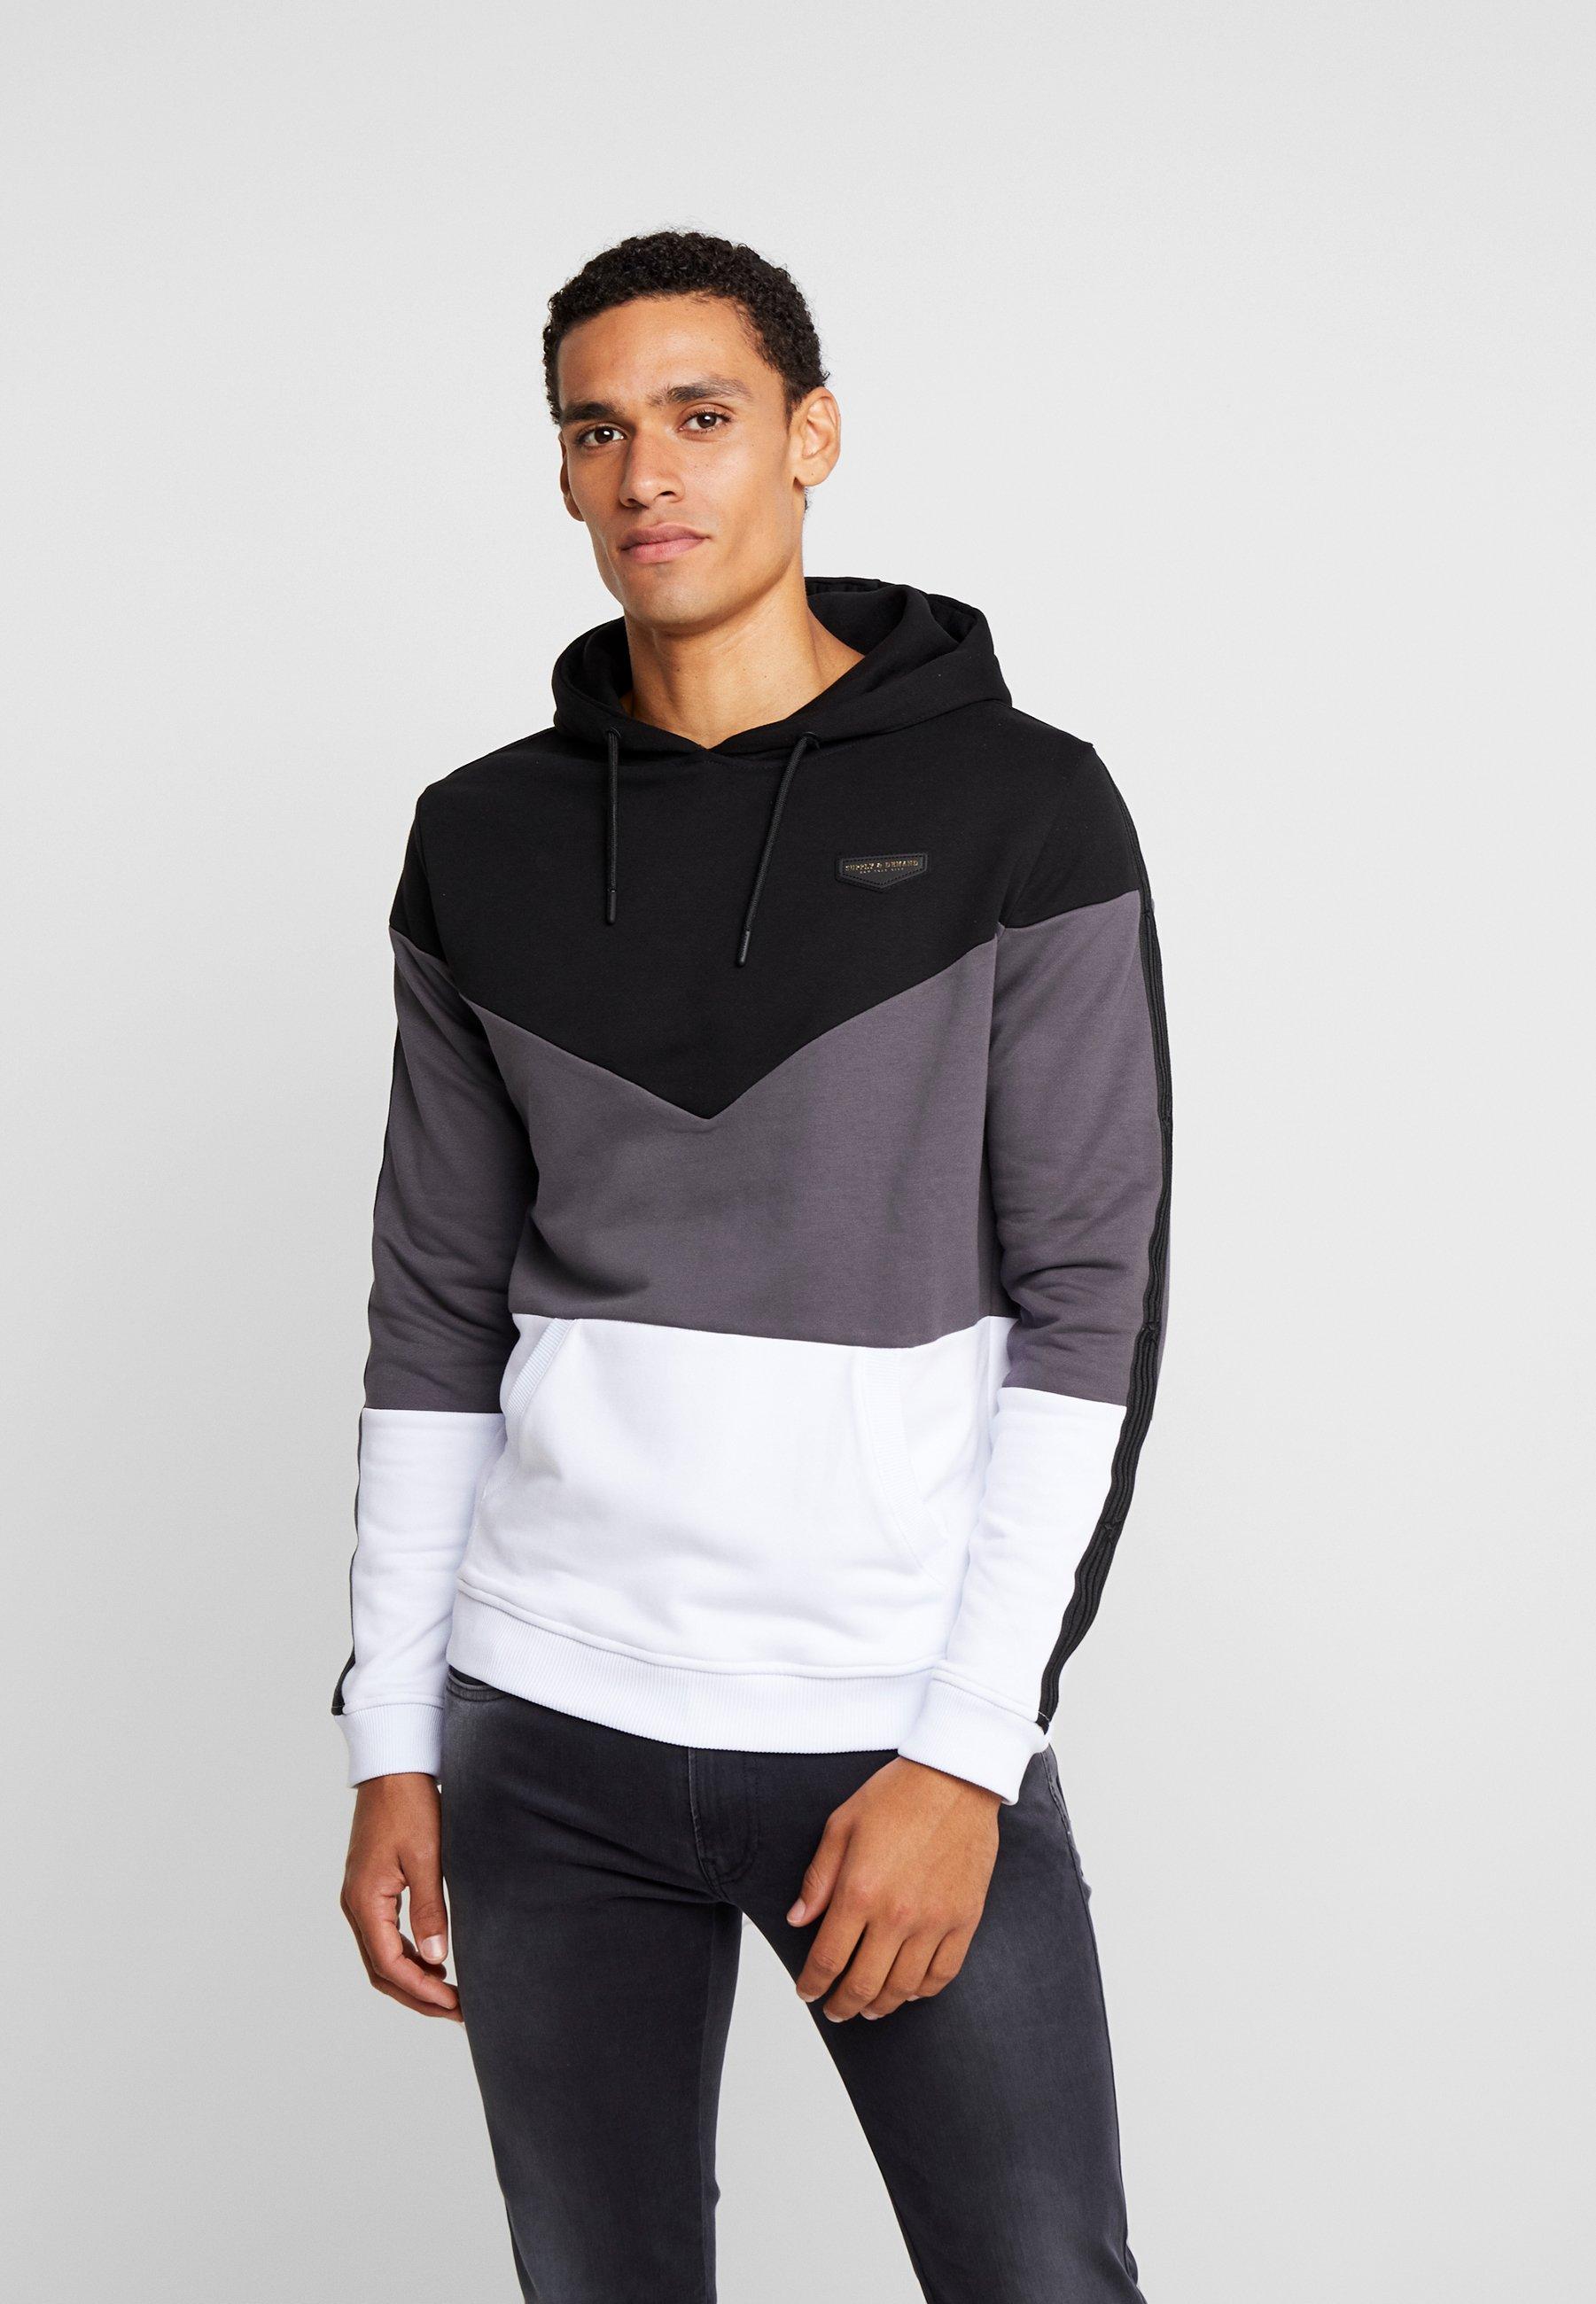 Supplyamp; Angle White Demand HoodSweatshirt black wyv0OnN8Pm